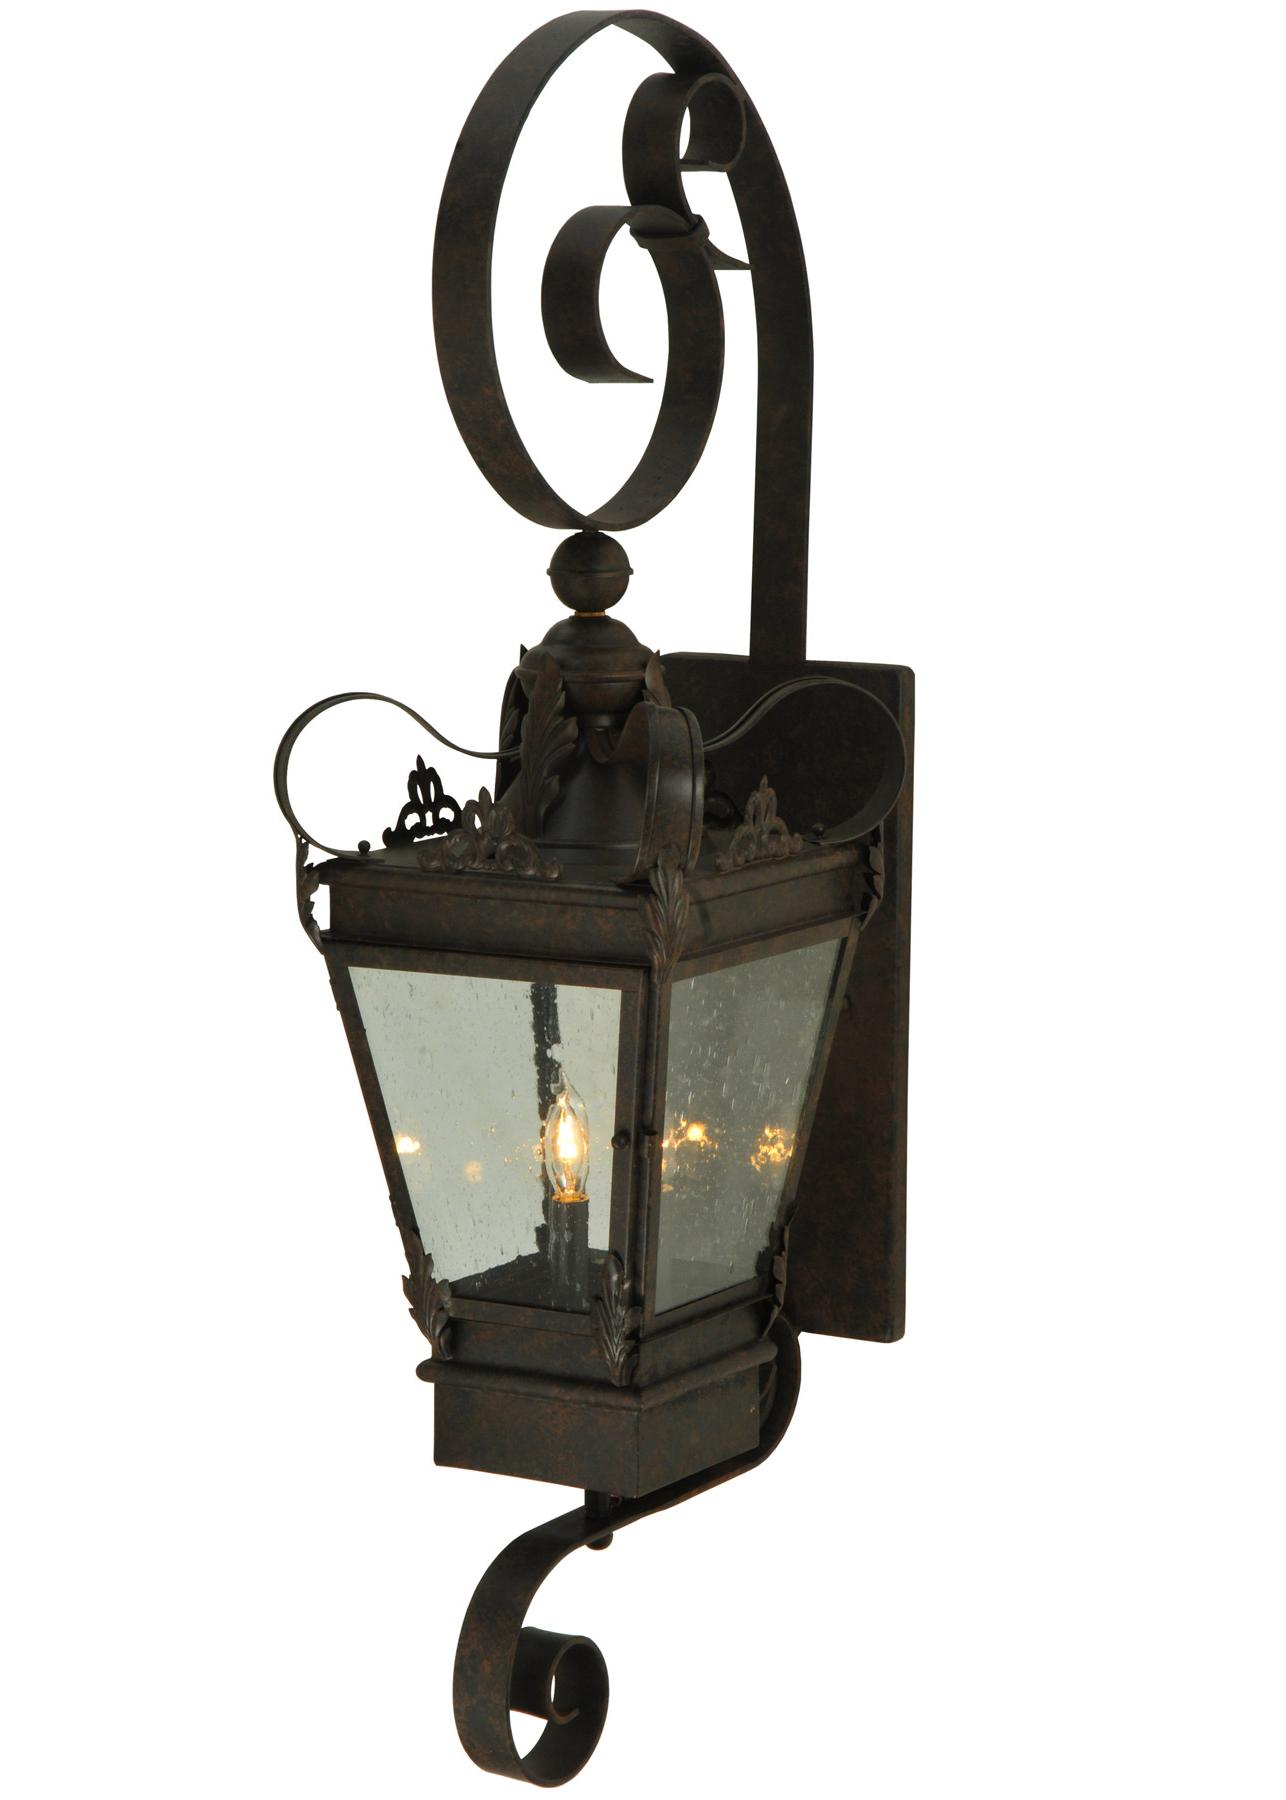 Current Gillett Outdoor Wall Lanterns Inside Meyda 129261 Verona Outdoor Wall Lantern (View 2 of 20)